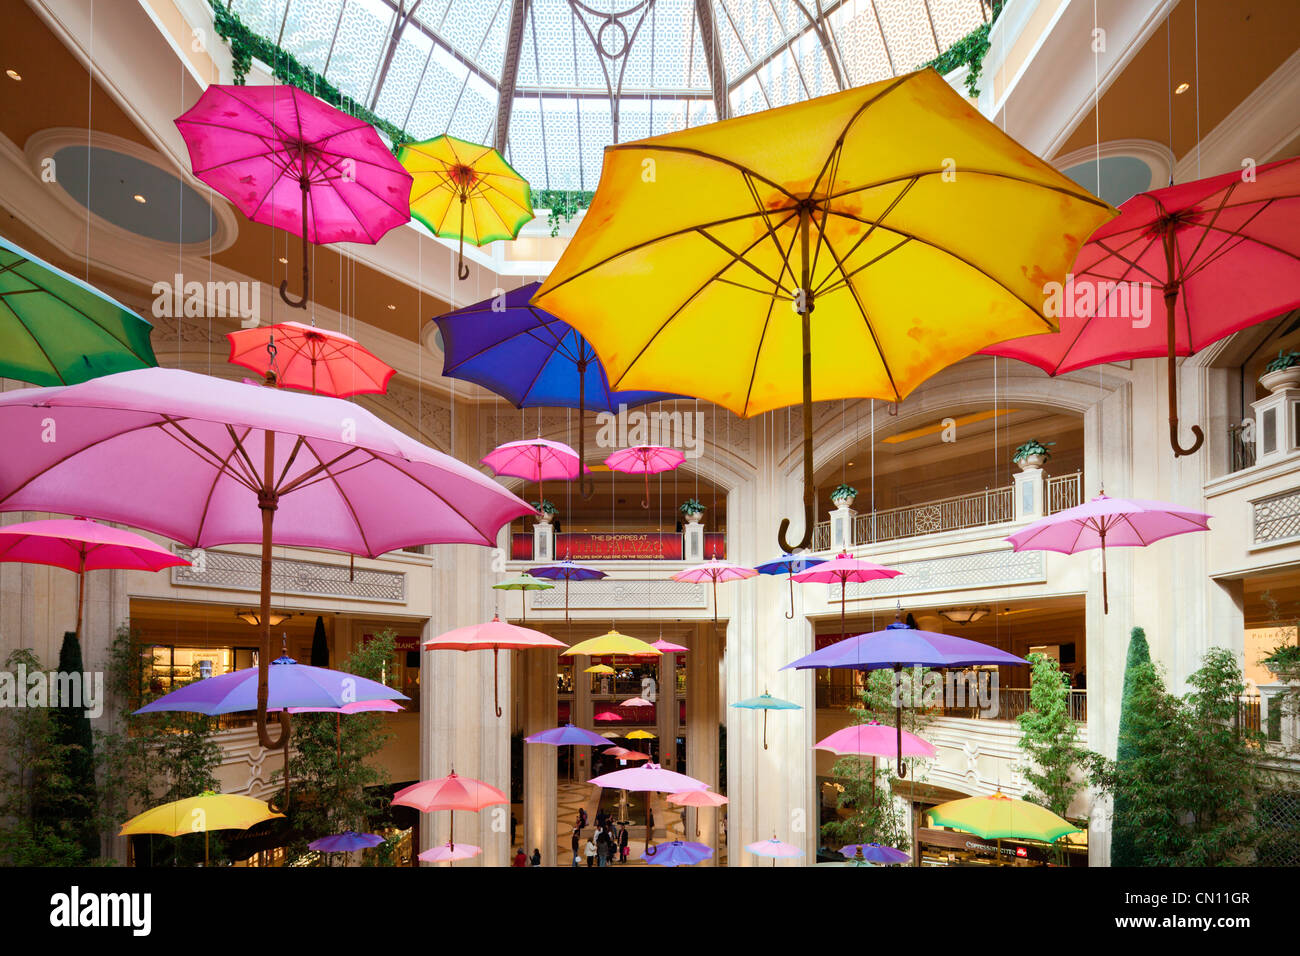 Hängende Schirme, Palazzo, Las Vegas-Paradies Stockbild